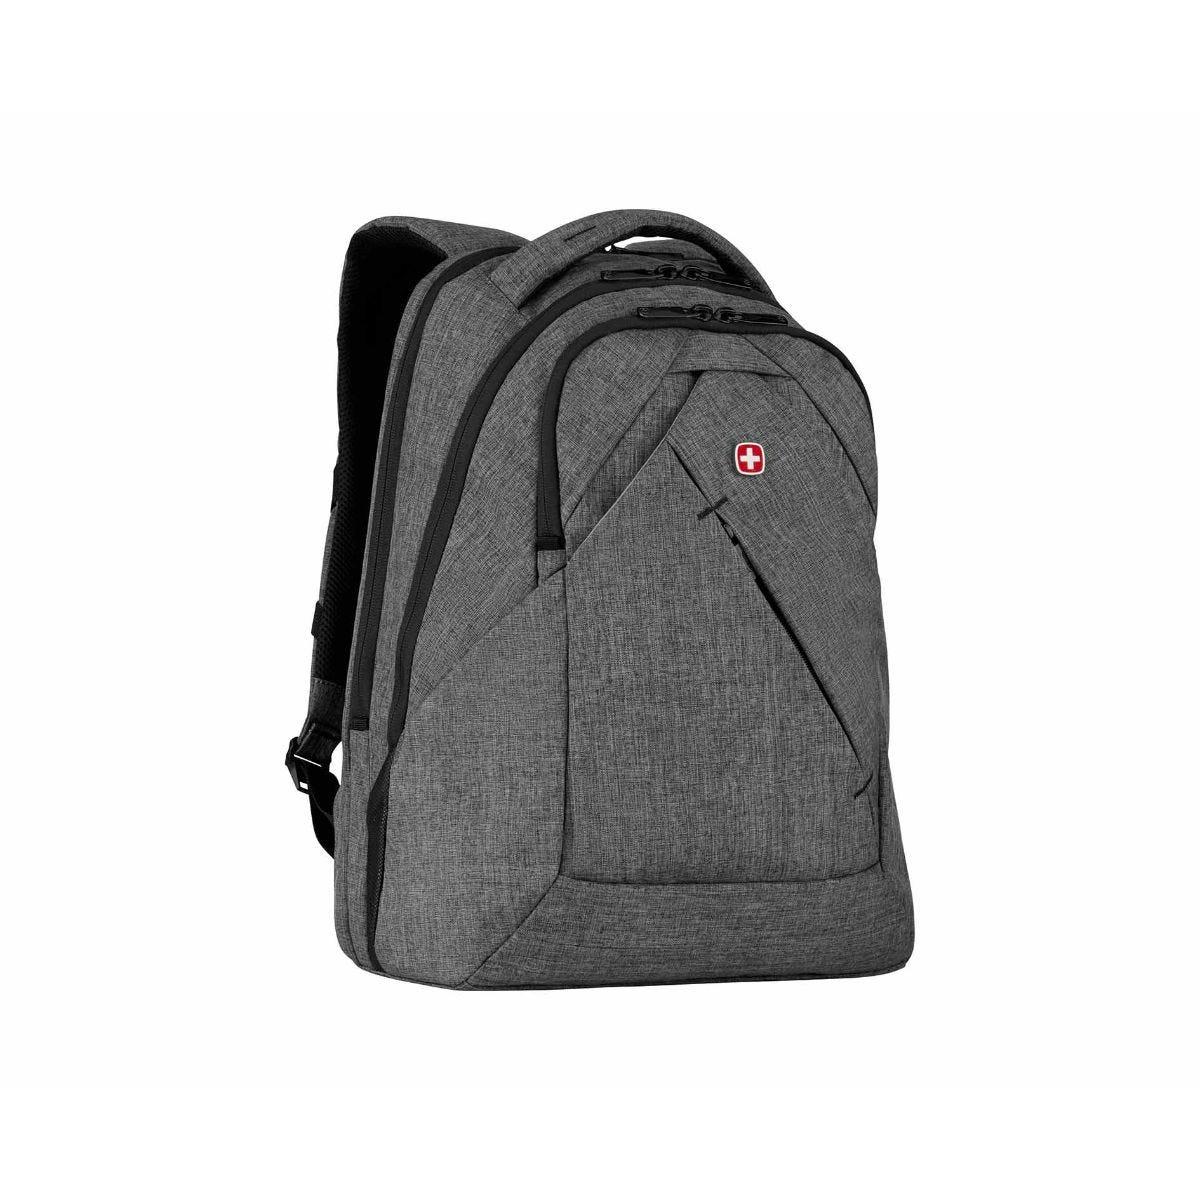 00a7d6c56a Luggage & Travel Bags | Ryman® UK